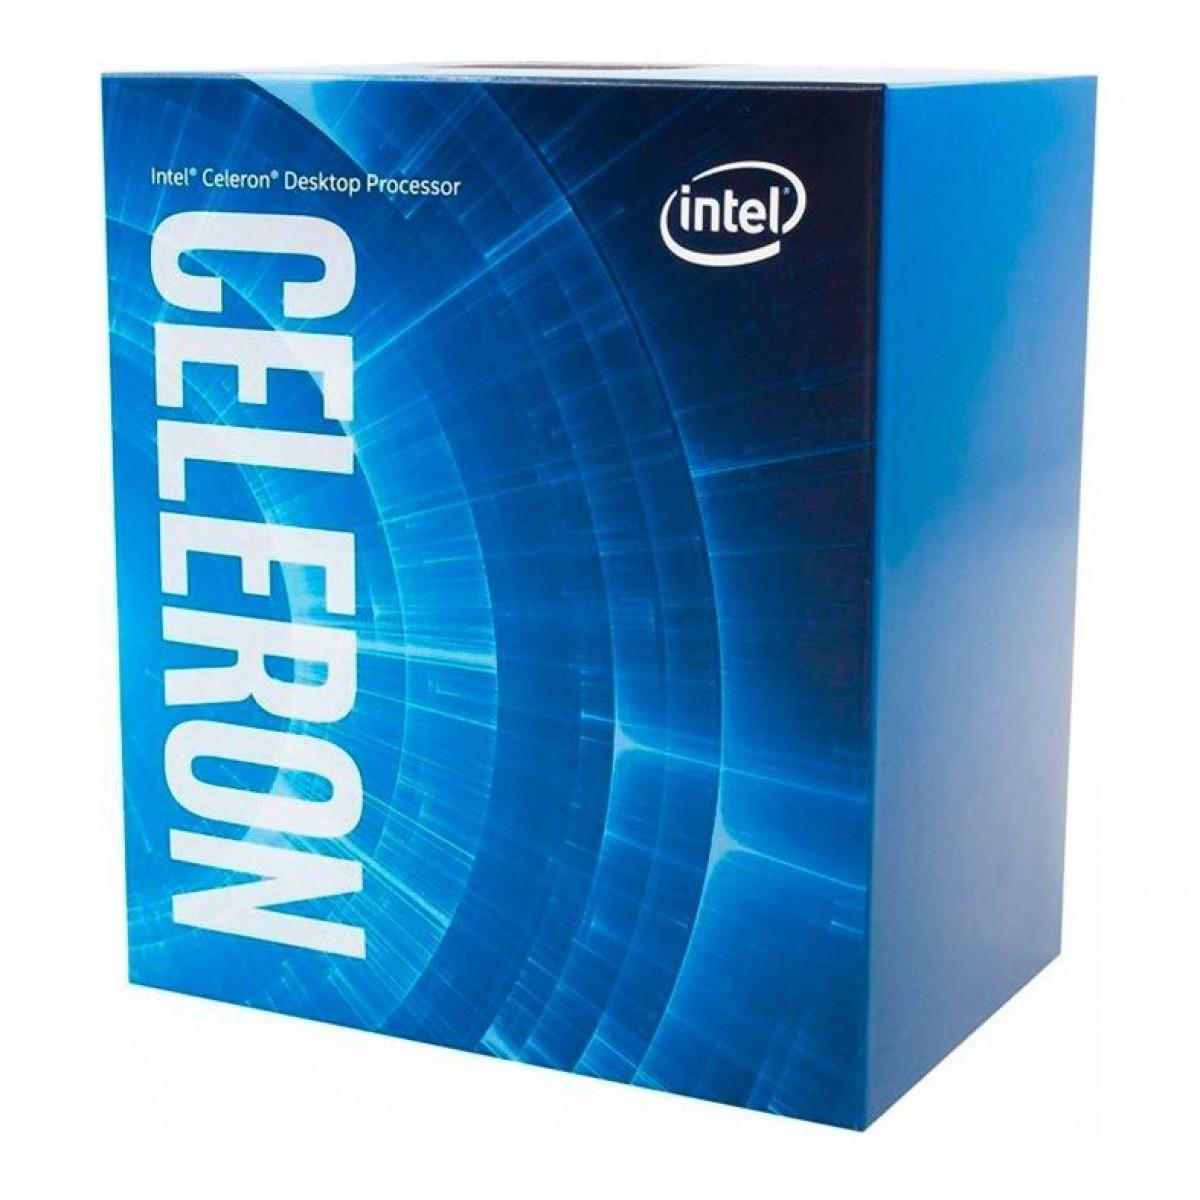 Processador Intel Celeron G5925 3.6GHz, 2-Cores 2-Threads, LGA 1200, BX80701G5925